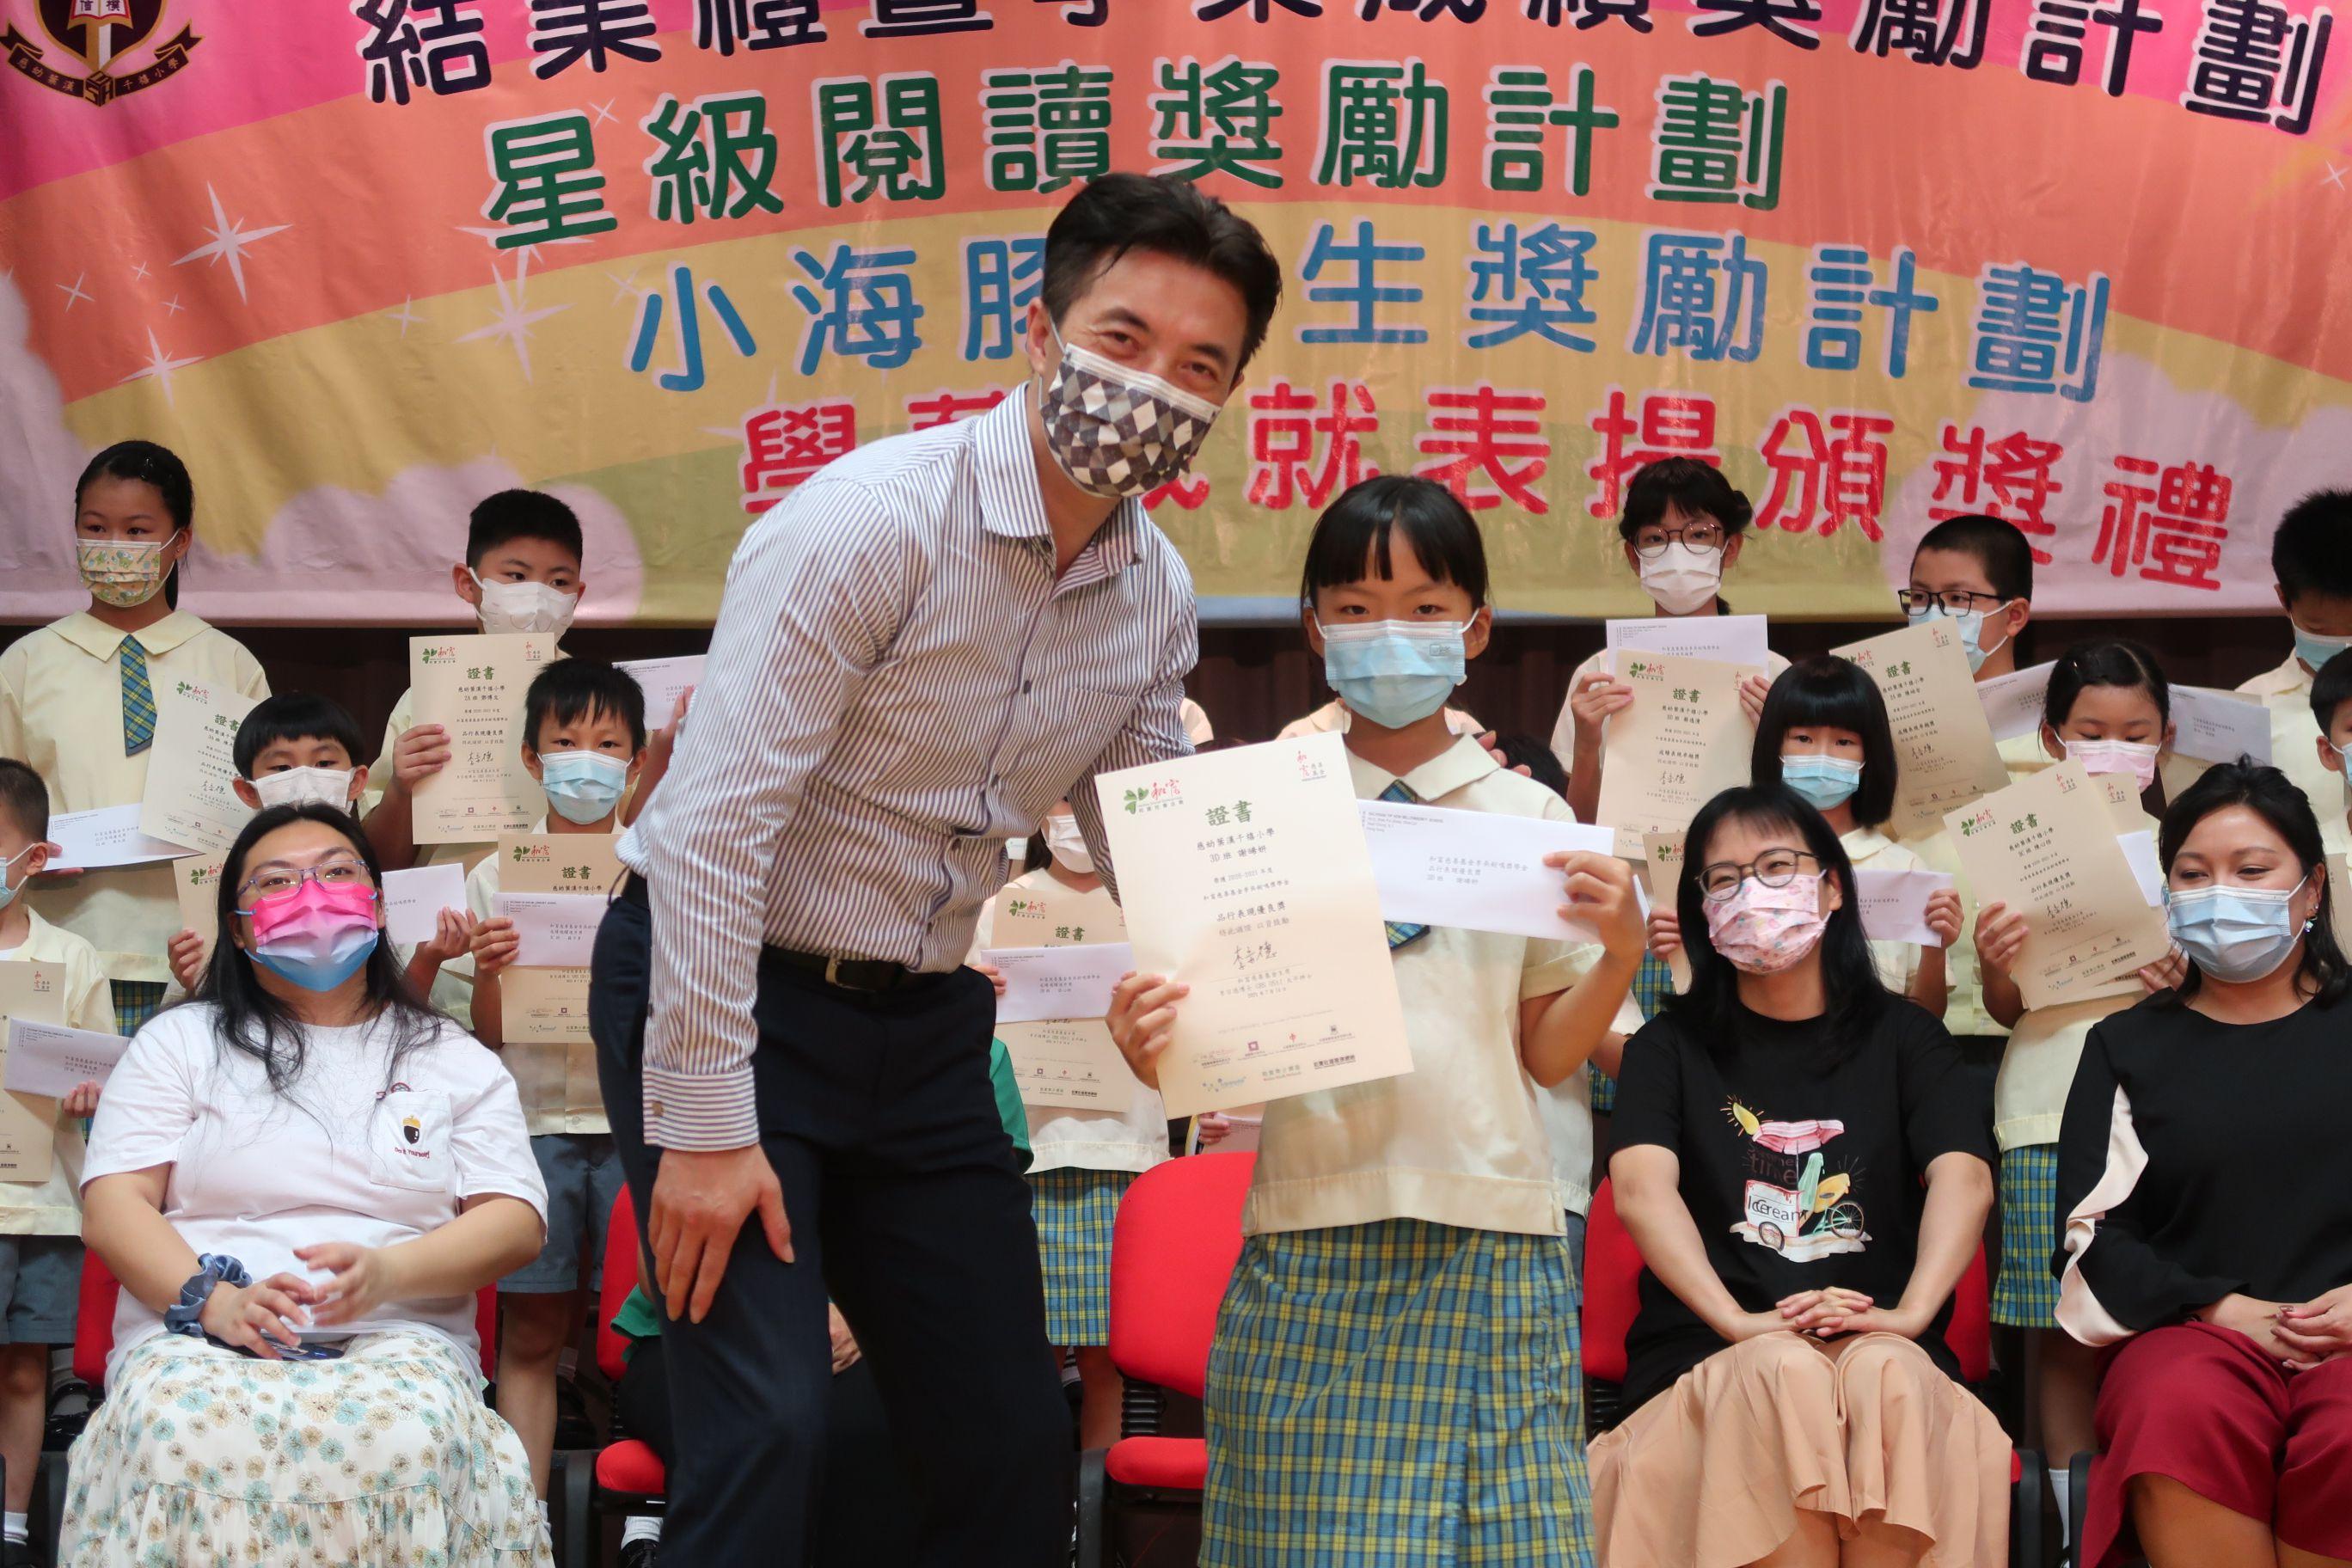 https://syh.edu.hk/sites/default/files/img_5963_1.jpg